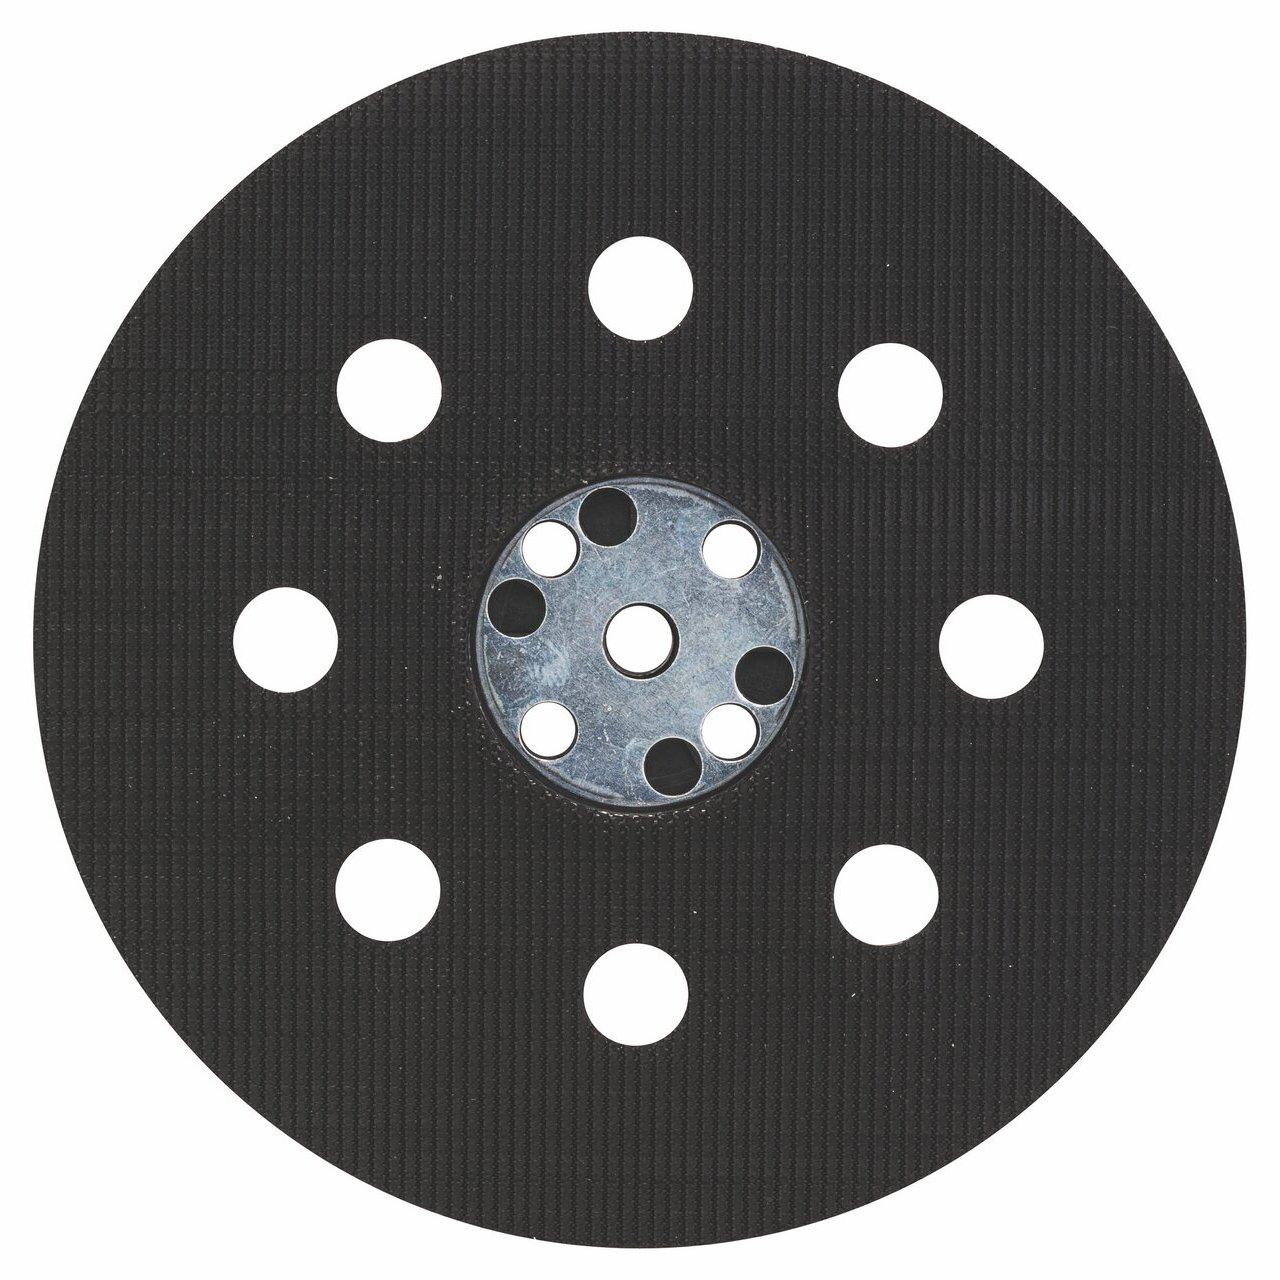 Bosch Sanding Pads Hard, 115mm, Sanding Pads (2 608 601 064) 2608601064 B000R5I8M0